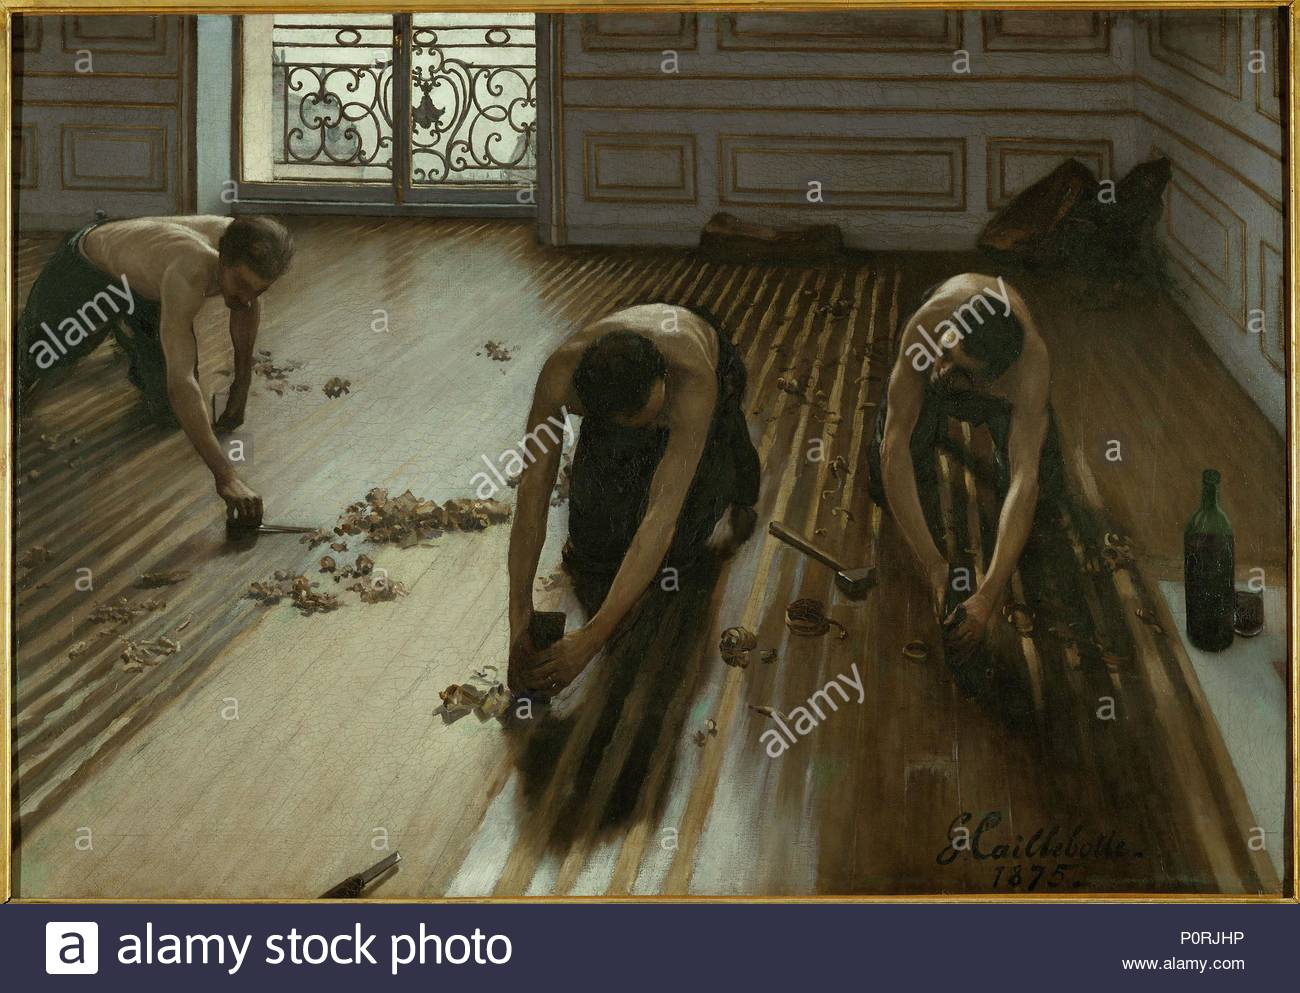 Les Raboteurs de Parquets. Oil on canvas (1875) RF 2718. Author: Gustave Caillebotte (1848-1894). Location: Musee d'Orsay, Paris, France. - Stock Image